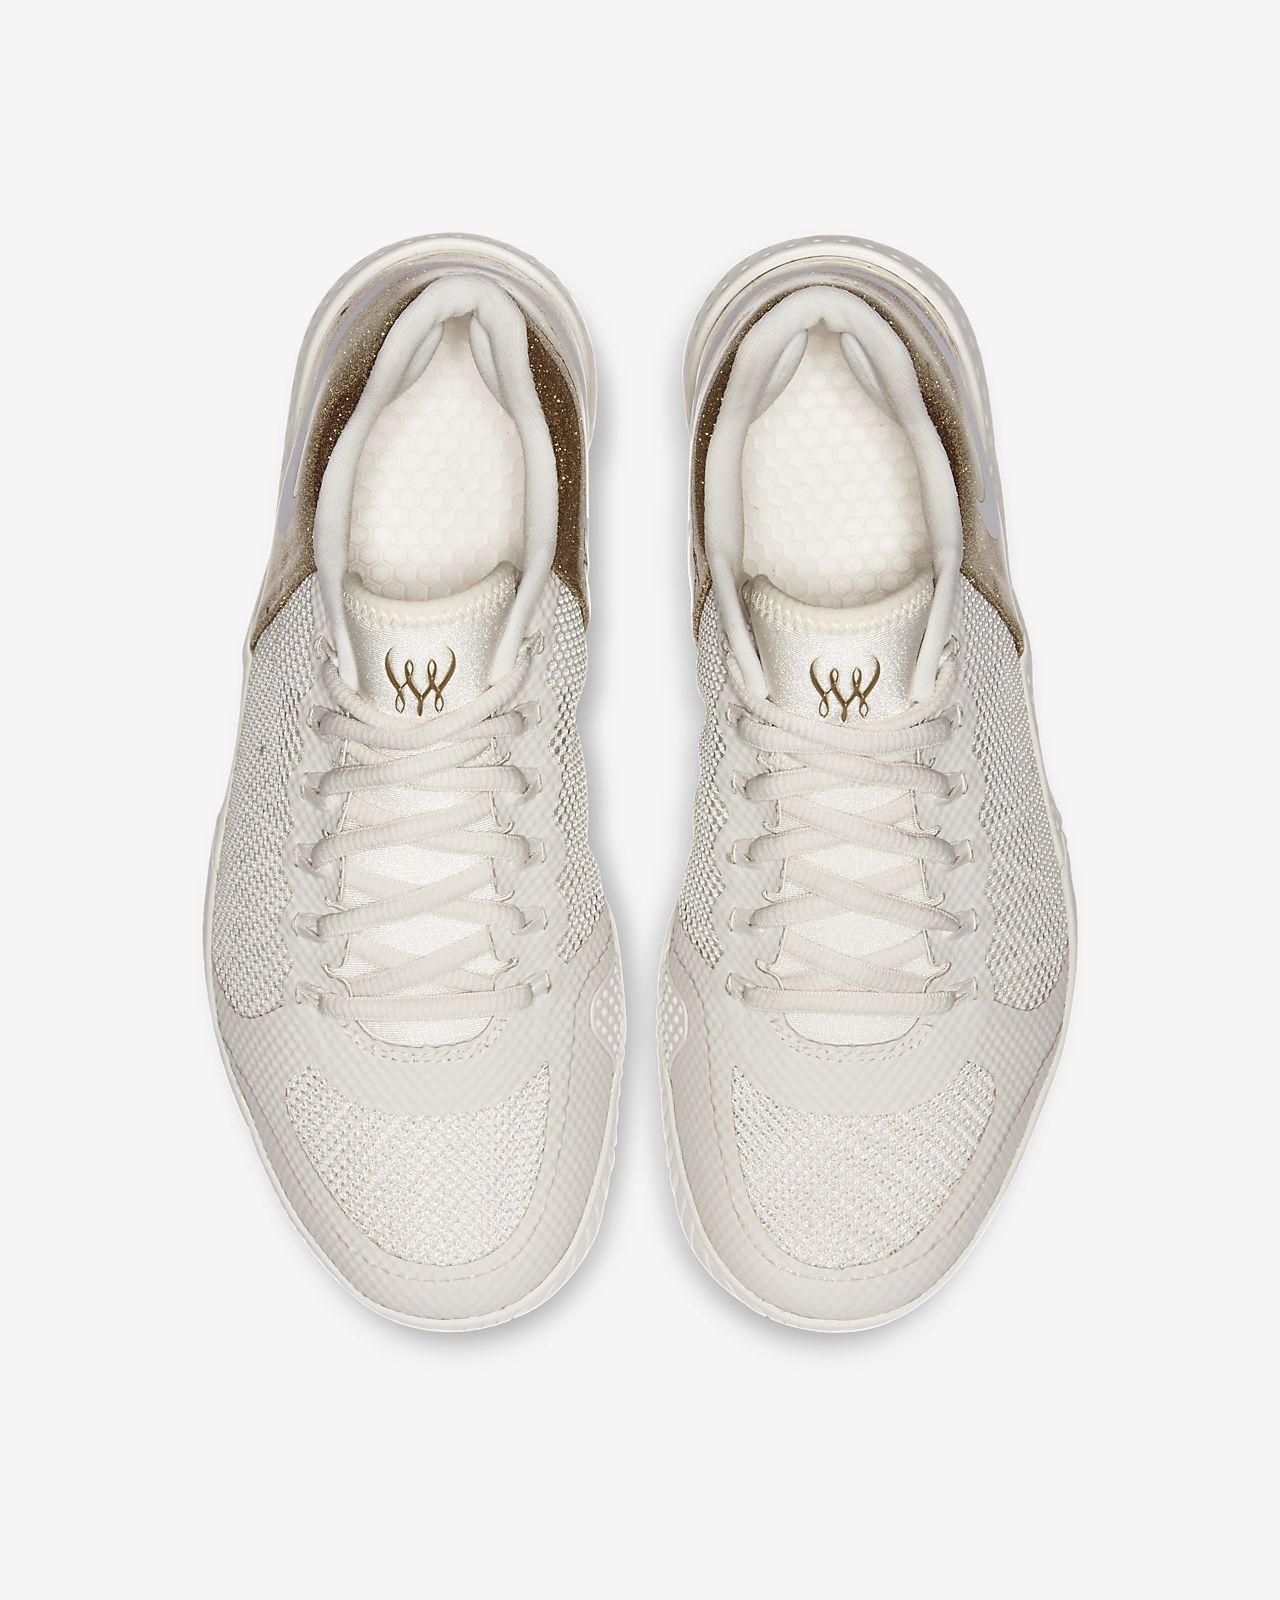 NikeCourt Flare Nike News